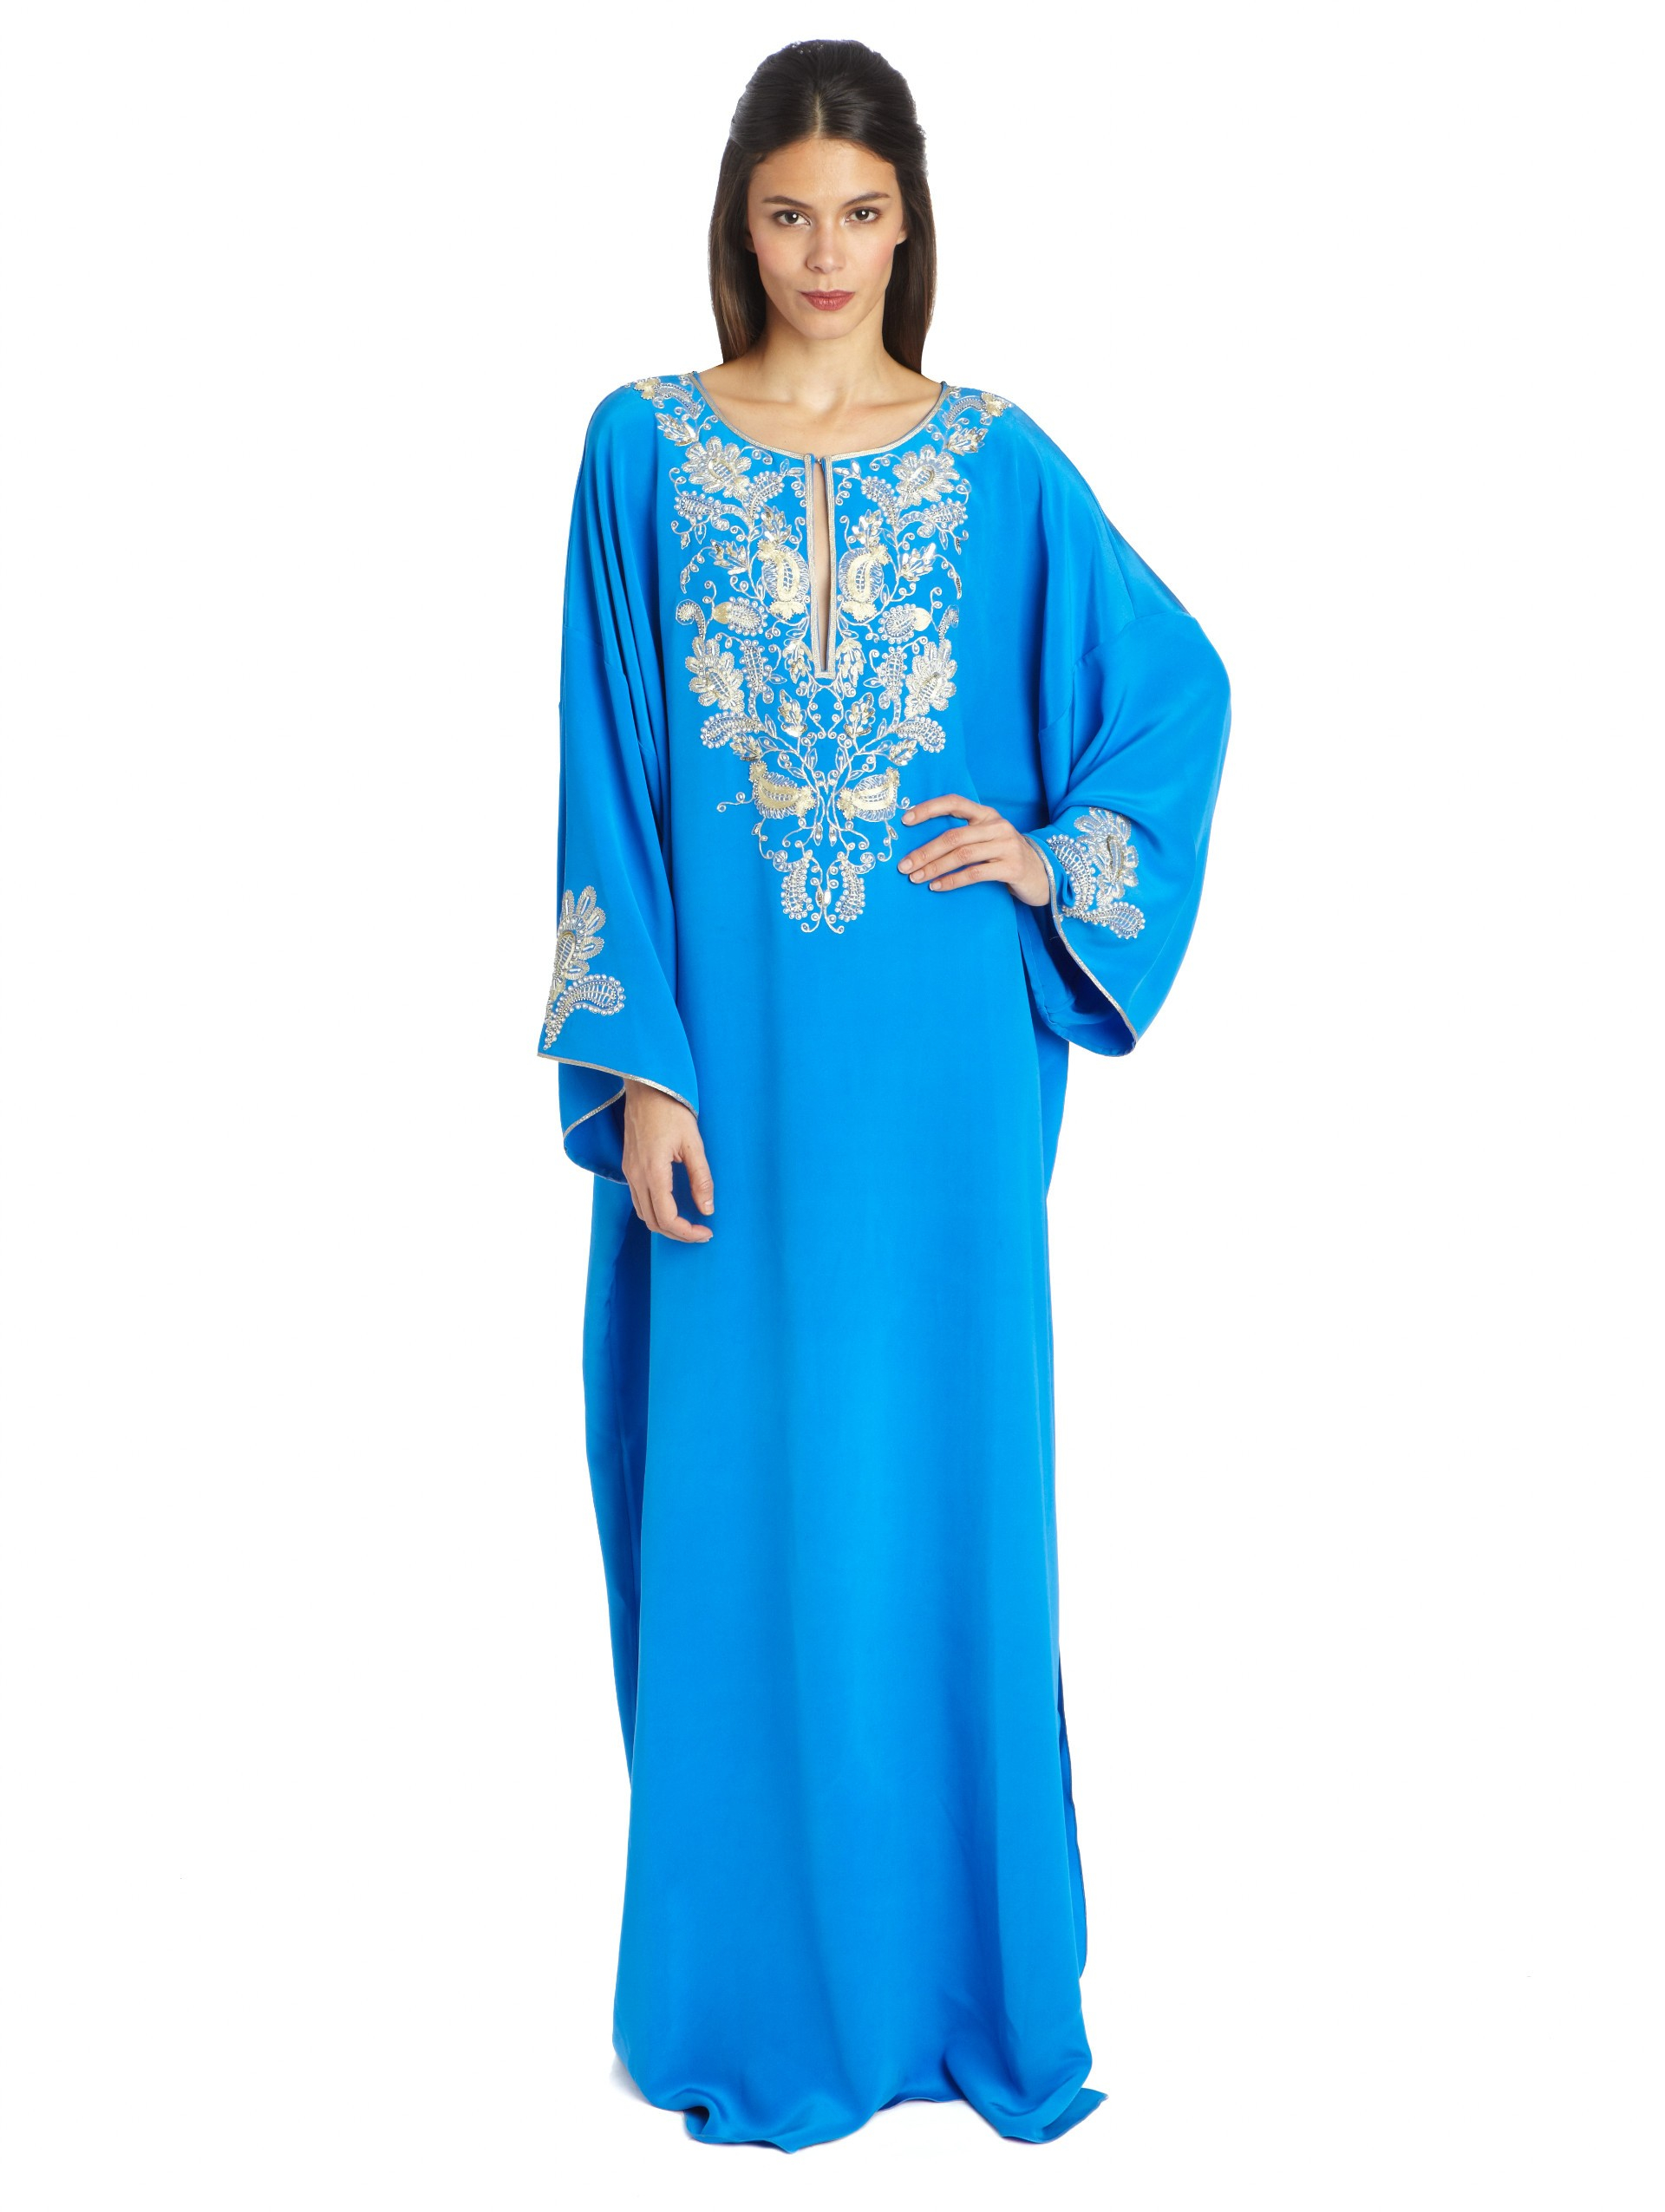 5bf0faac6a Lyst - Oscar de la Renta Long-Sleeve Embroidered Caftan in Blue